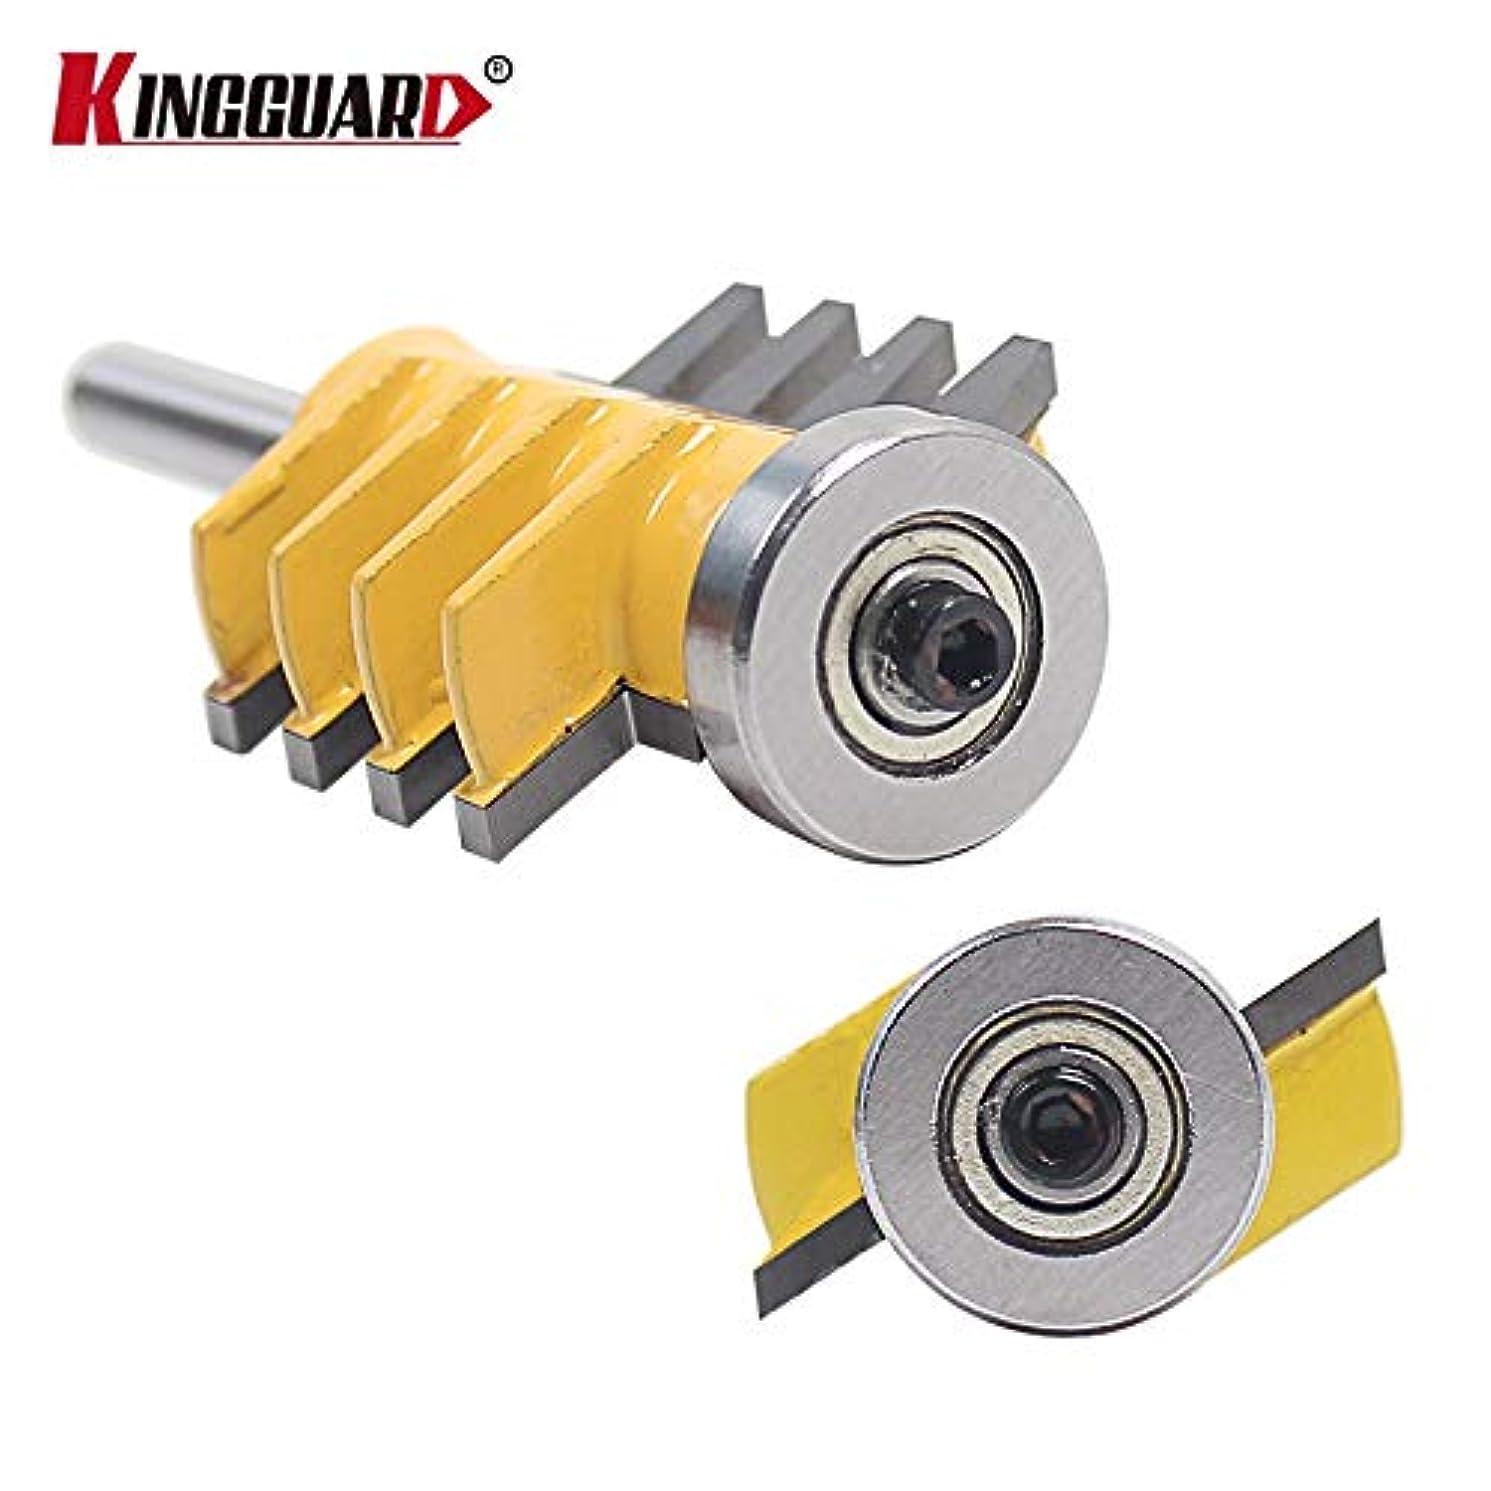 1 piece KINGGUARD 1/4 Shank Rail Reversible Finger Joint Glue Router Bit Cone Tenon Woodwork Cutter Power Tools